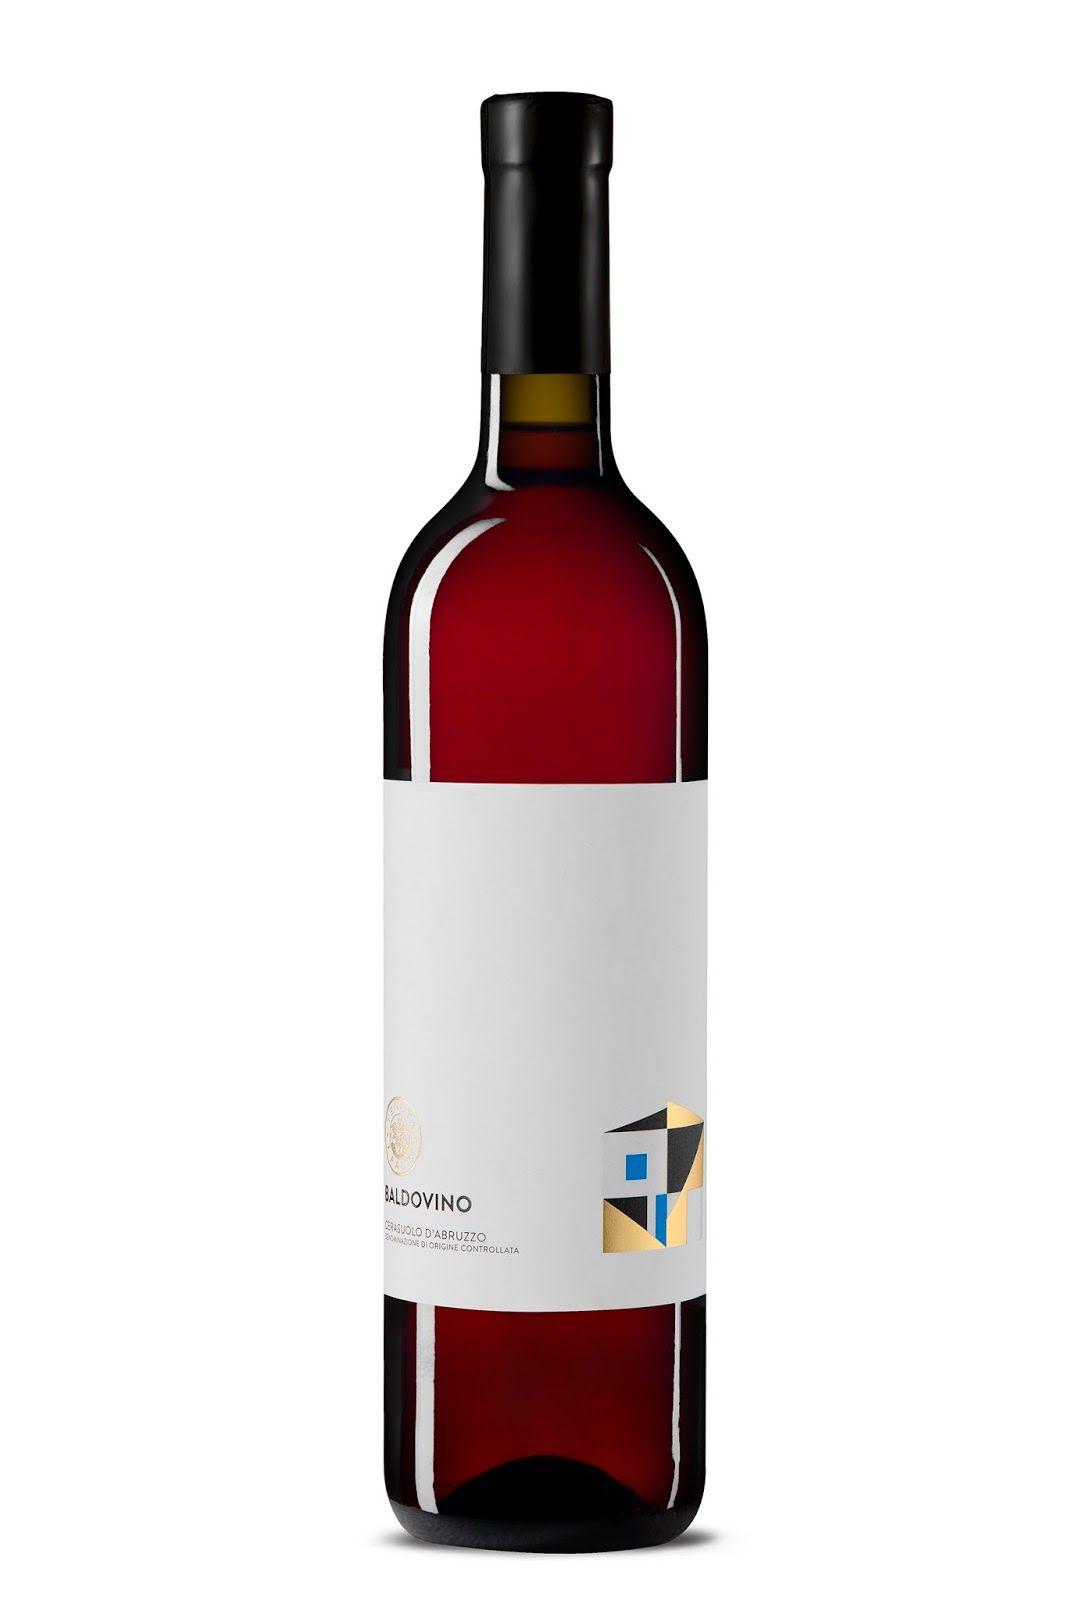 Baldovino On Packaging Of The World Creative Package Design Gallery Wine Label Design Wine Label Packaging Wine Packaging